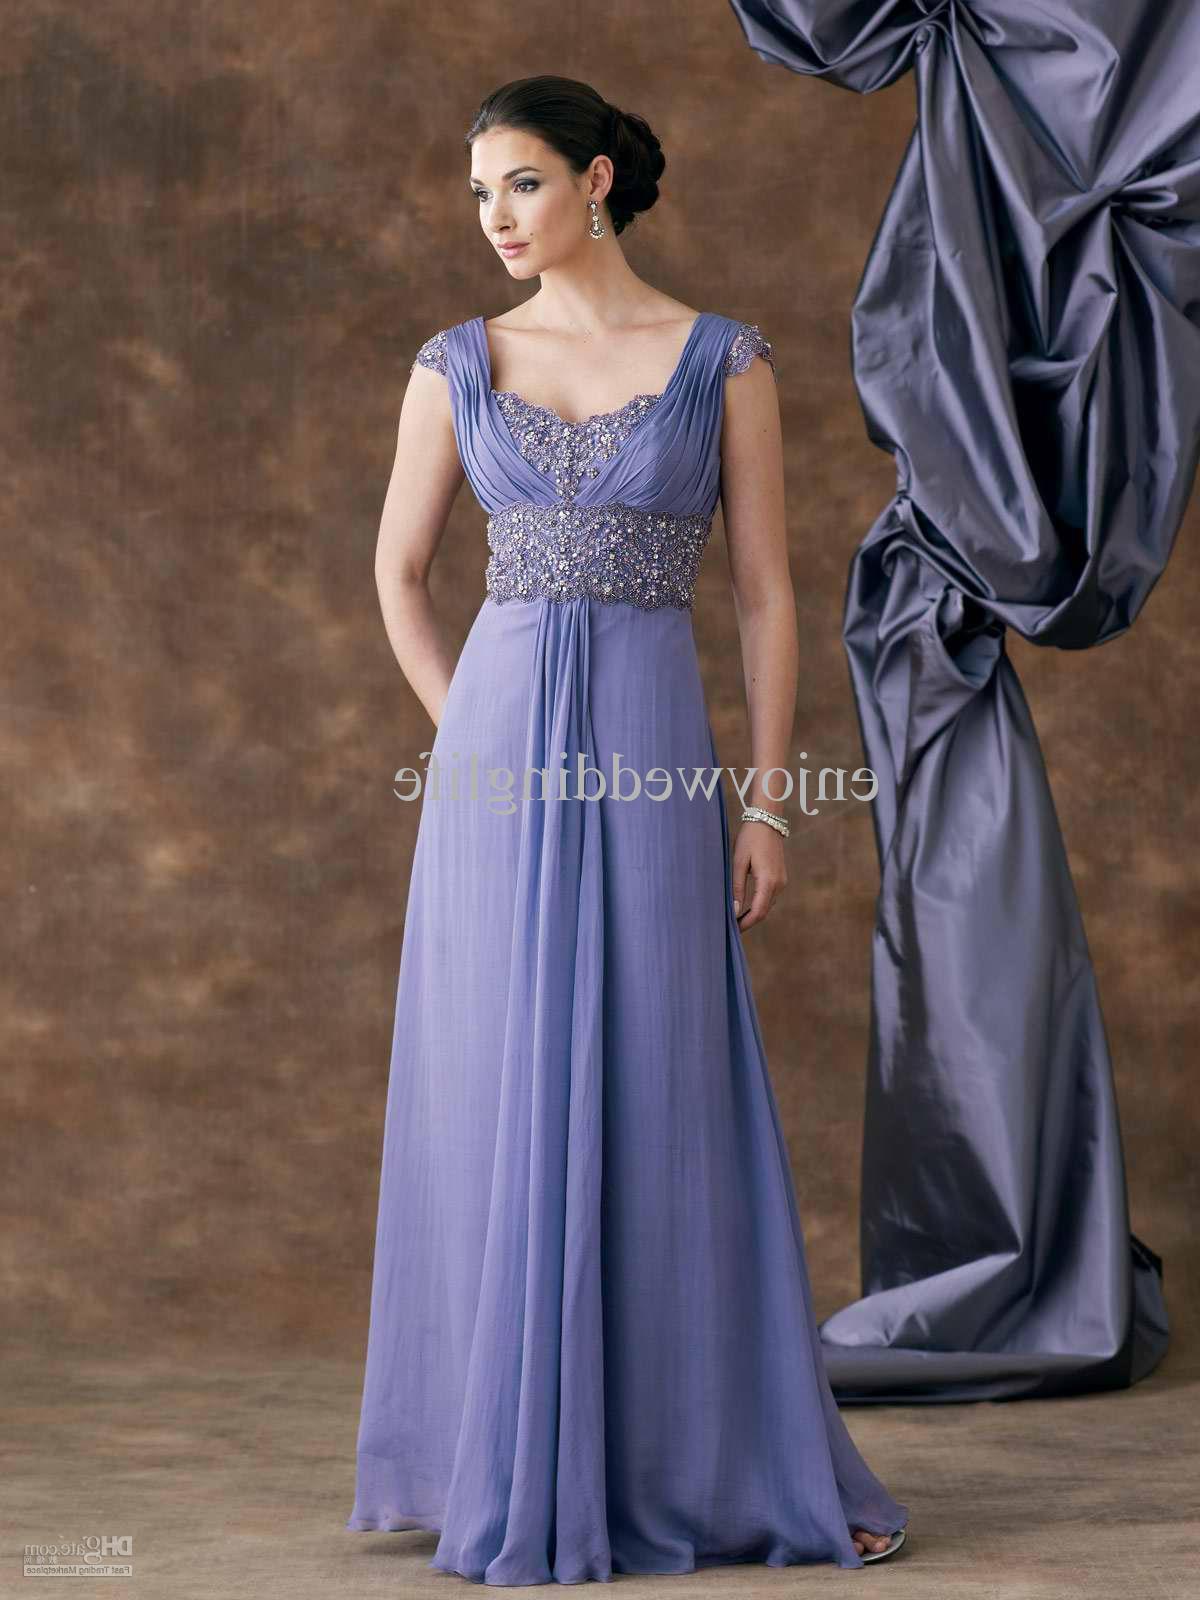 Train Lace Wedding Dresses